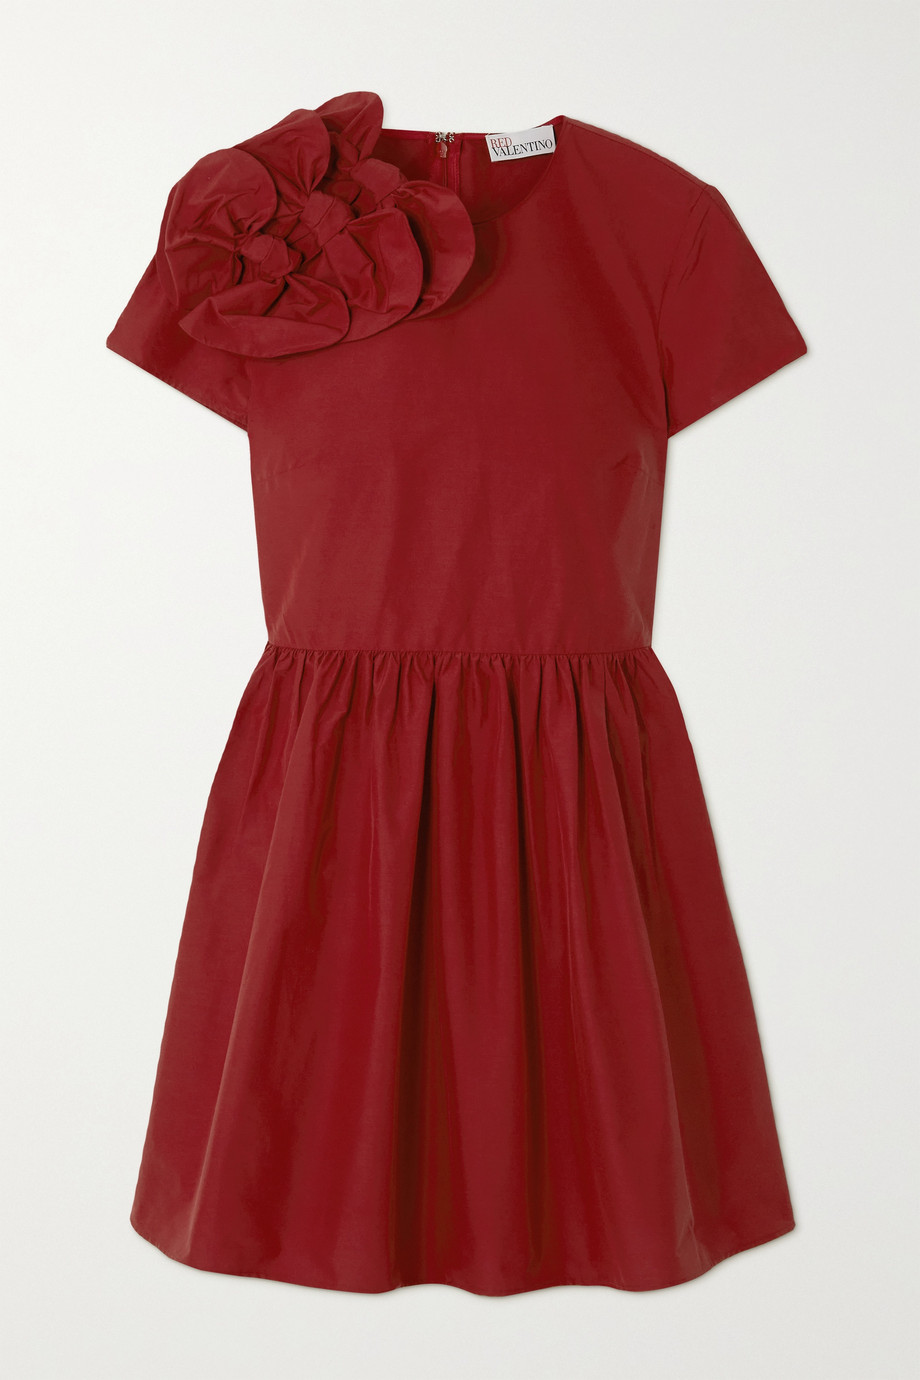 REDValentino Bow-embellished taffeta mini dress